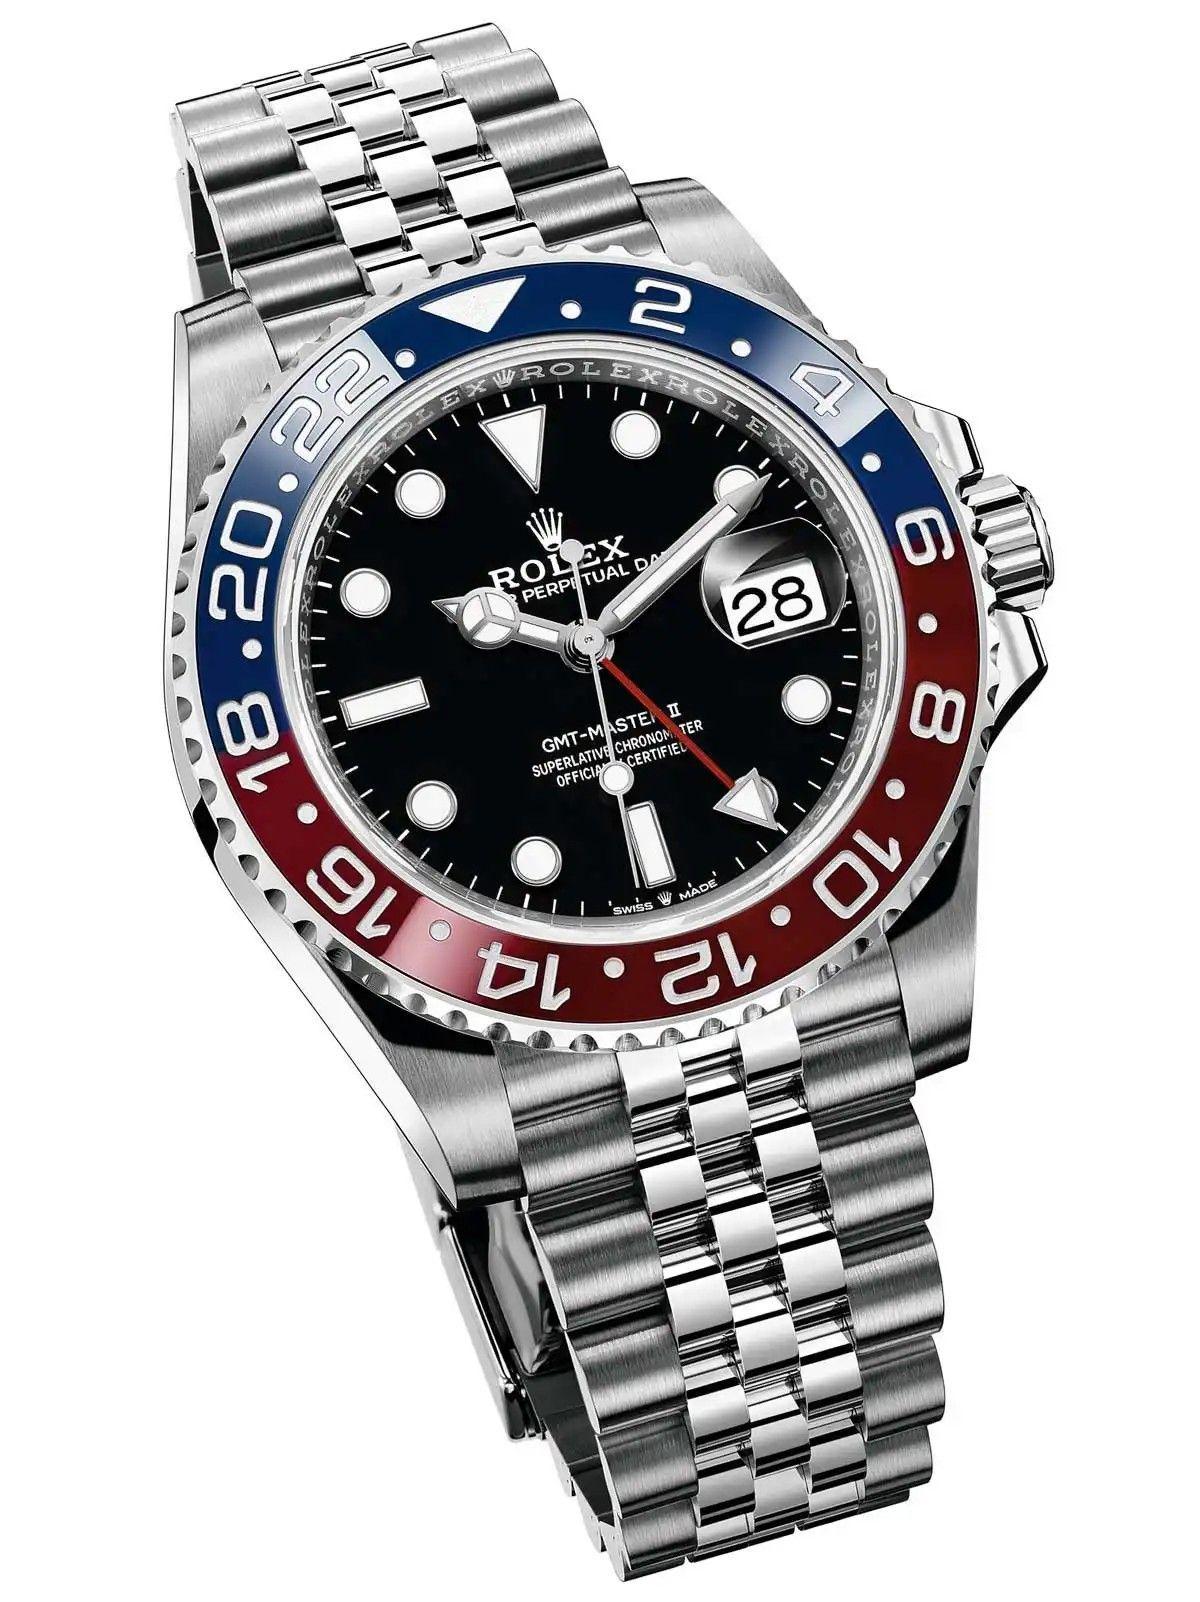 Rolex Gmt Master Ii Pepsi 126710 Blro Montre Rolex Montre Homme Luxe Montres De Diamants